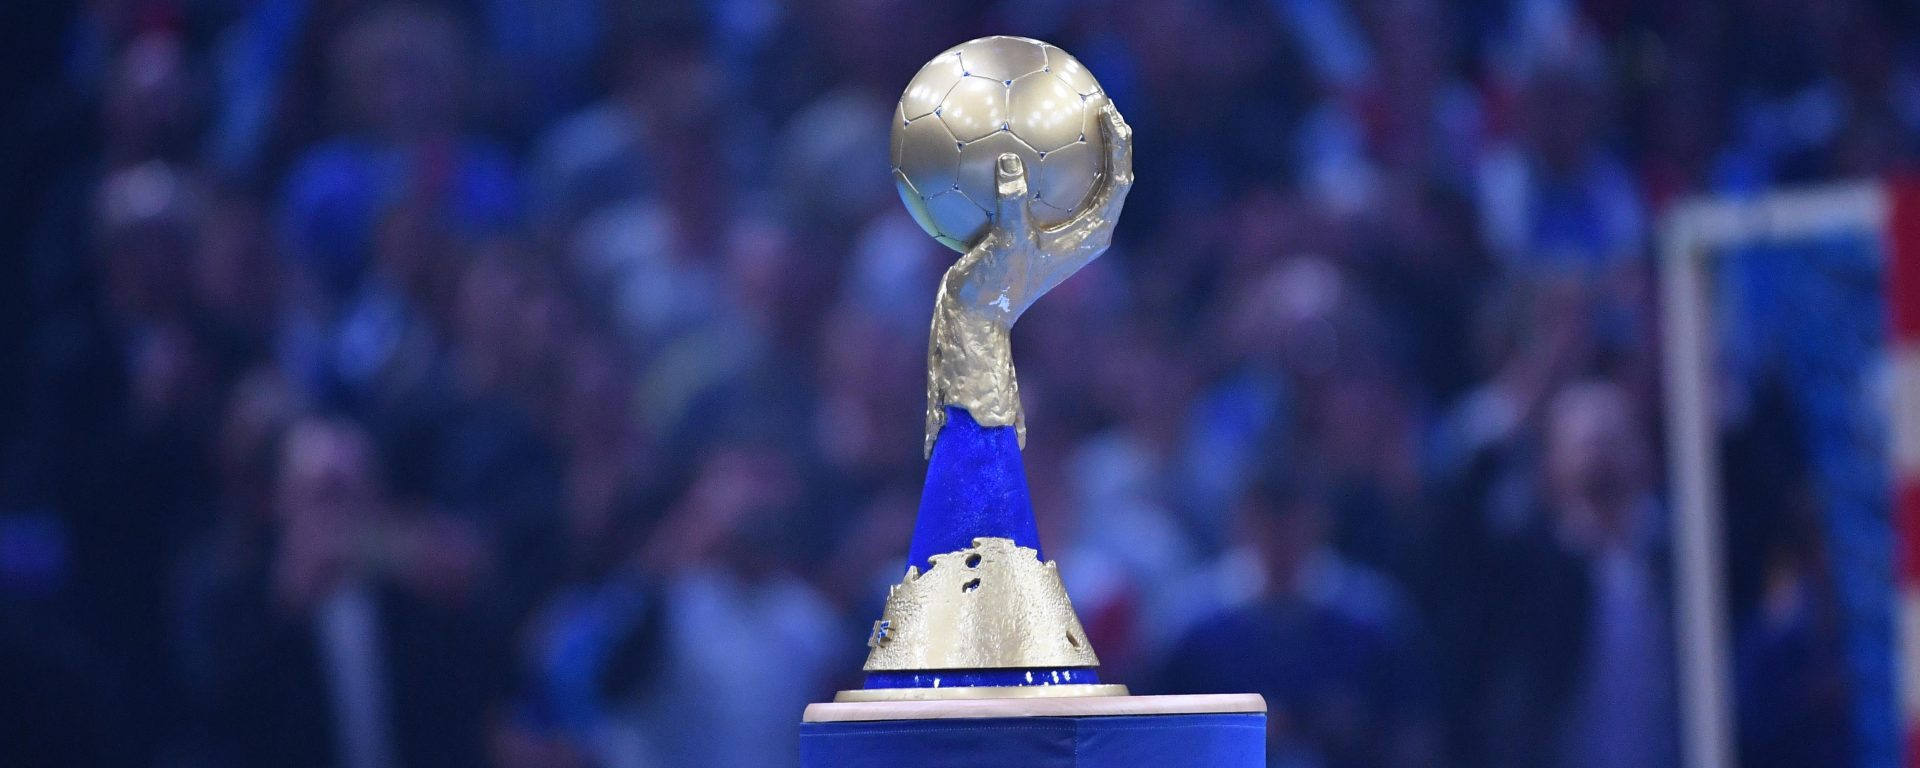 Six torique la france championne du monde de handball - Coupe d europe de handball ...